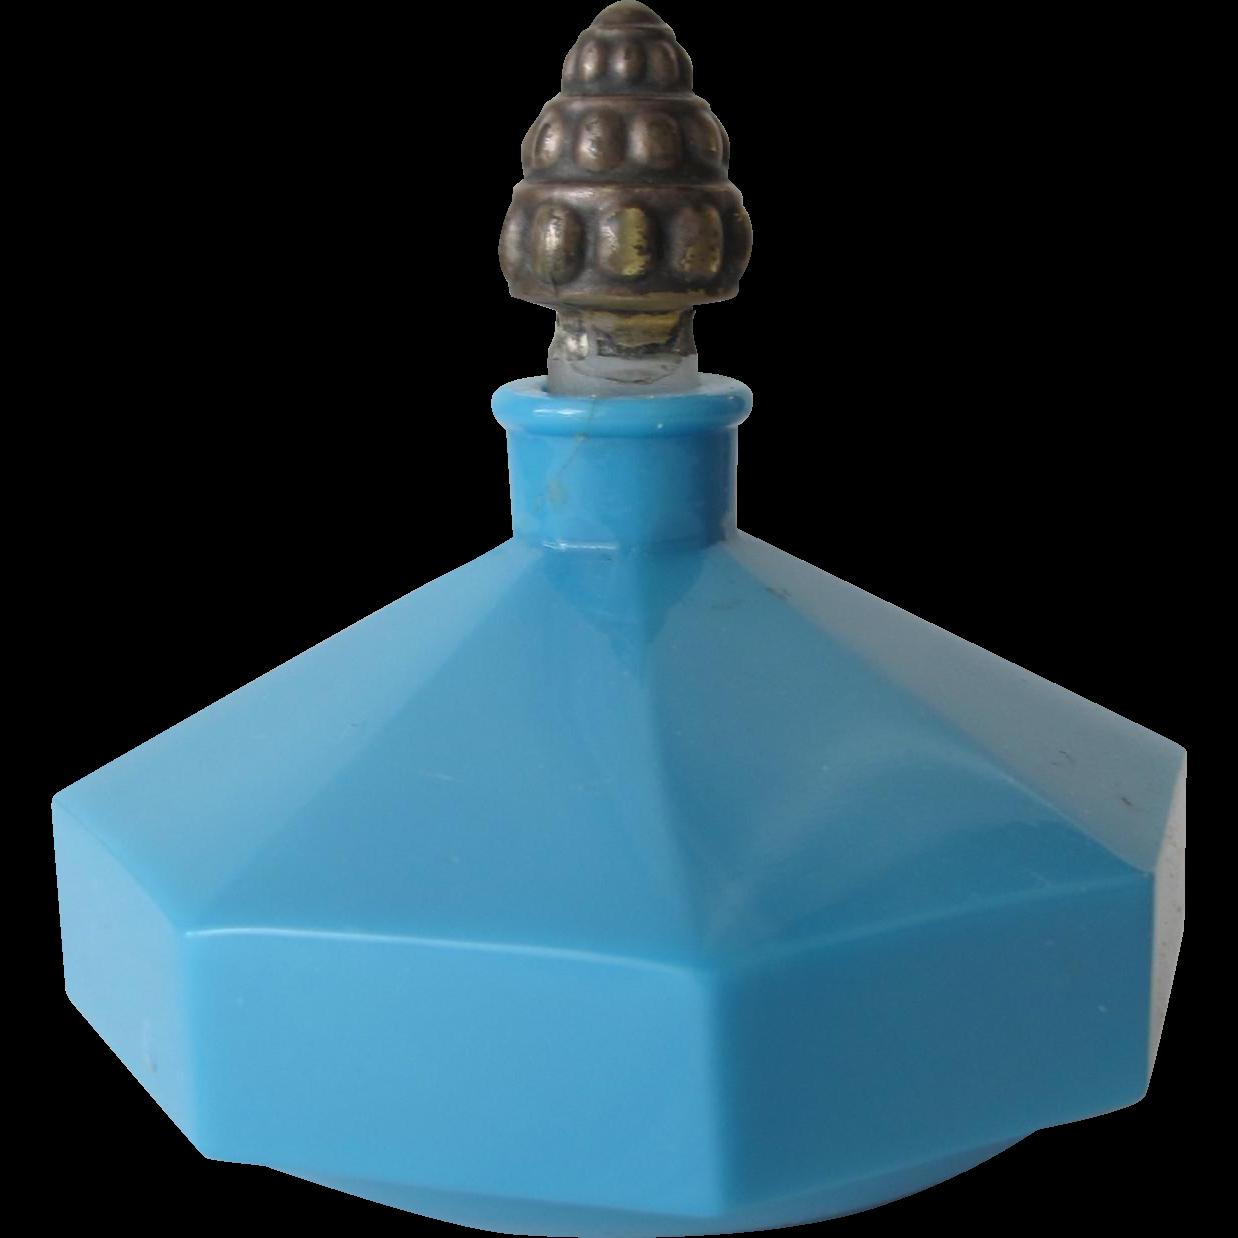 Rare Perfume Bottle by Richard Hudnut Le Debut 1927